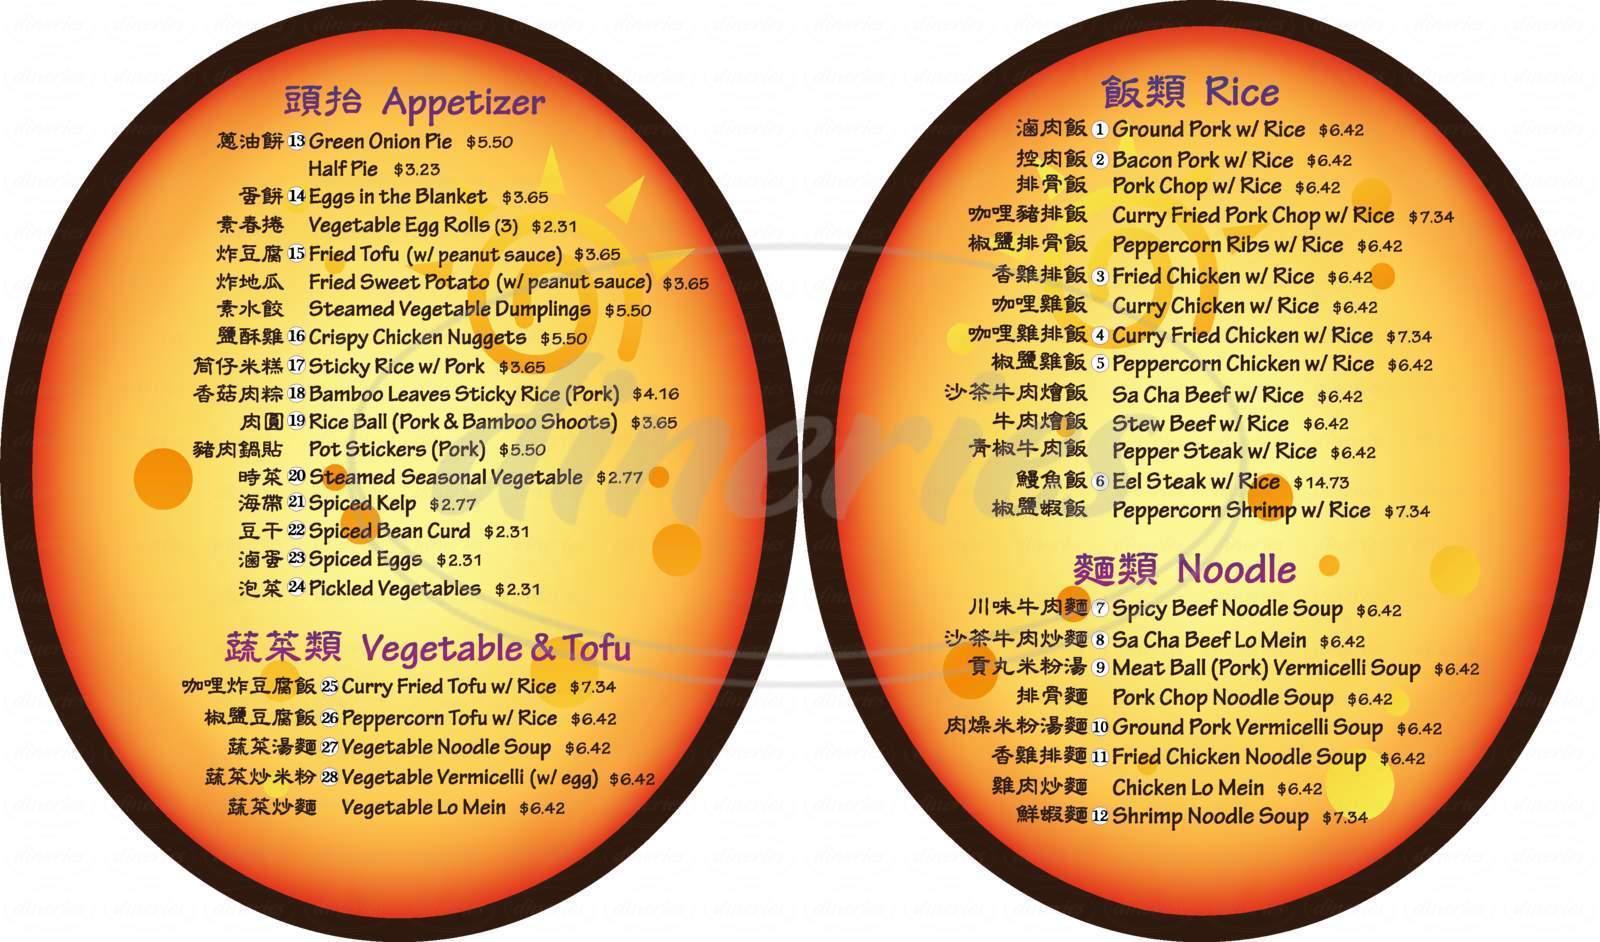 menu for Coco's Cafe